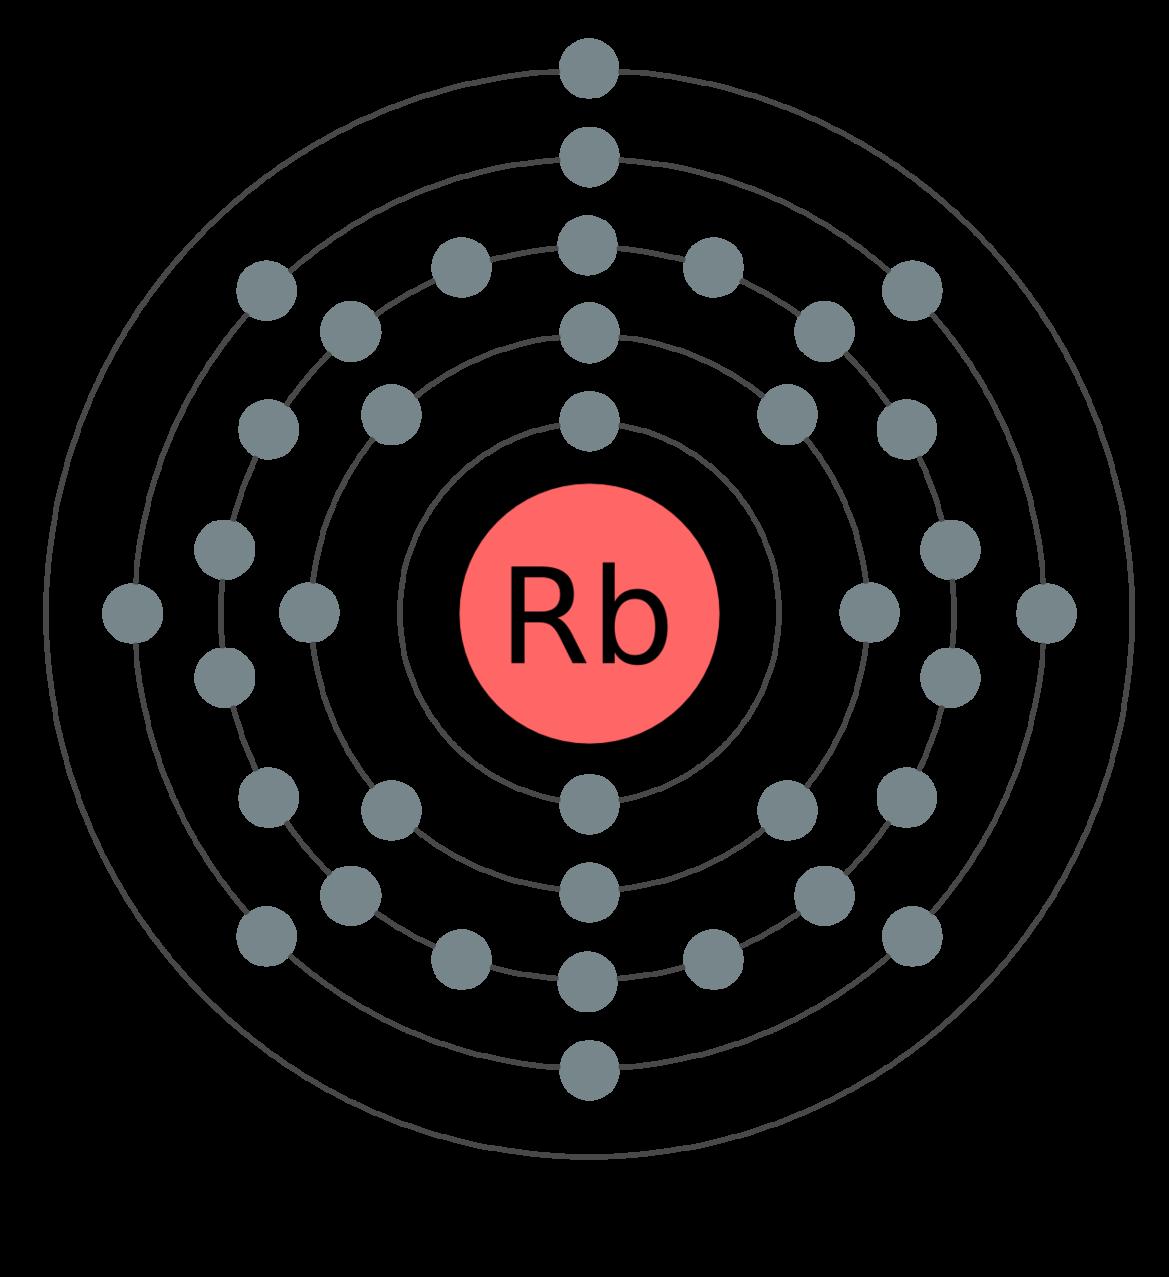 rubidium open science wiki fandom powered by wikia helium lewis diagram